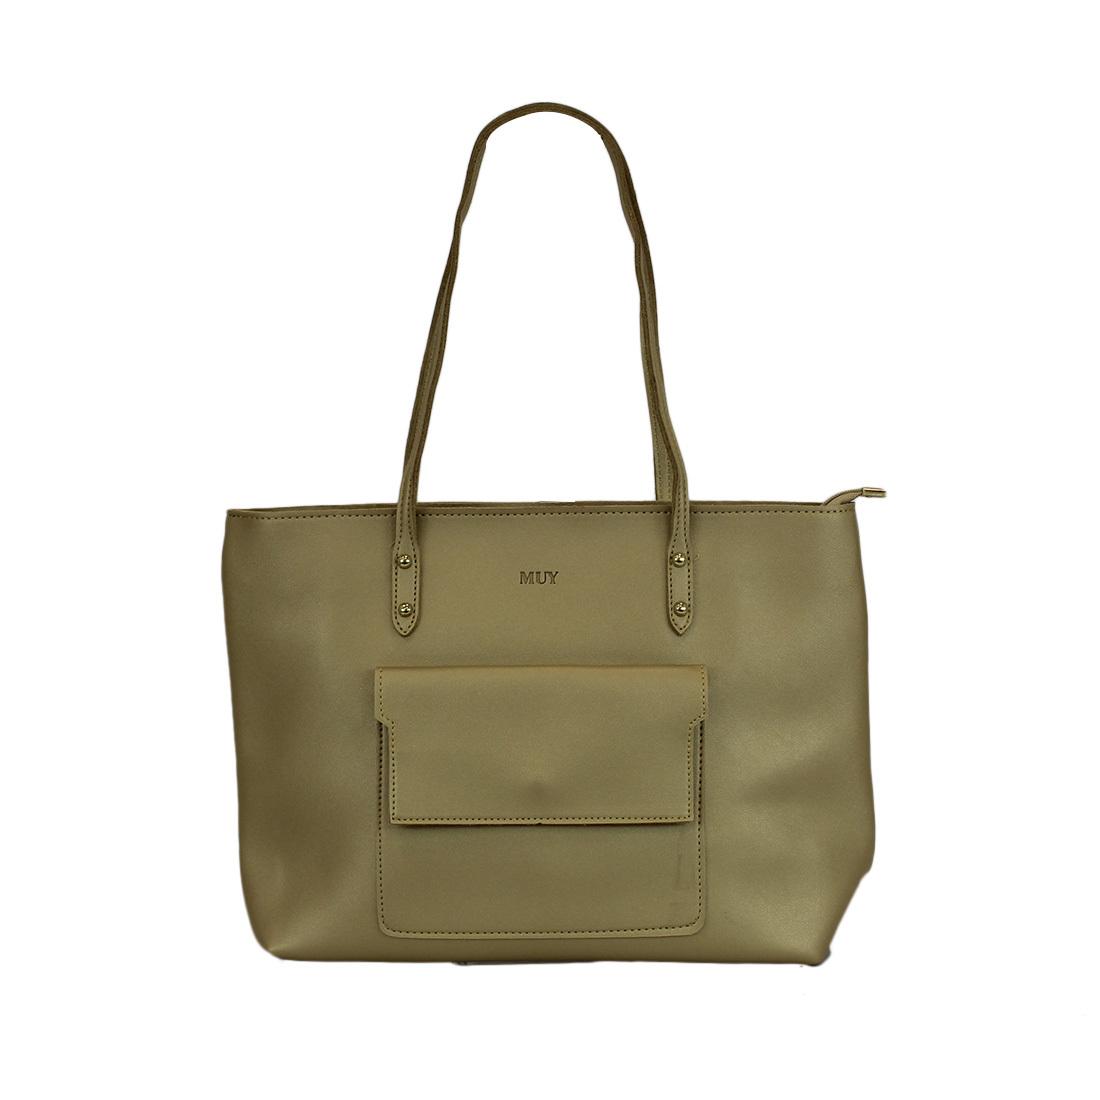 Leather plain large handle handbag with pocket on front